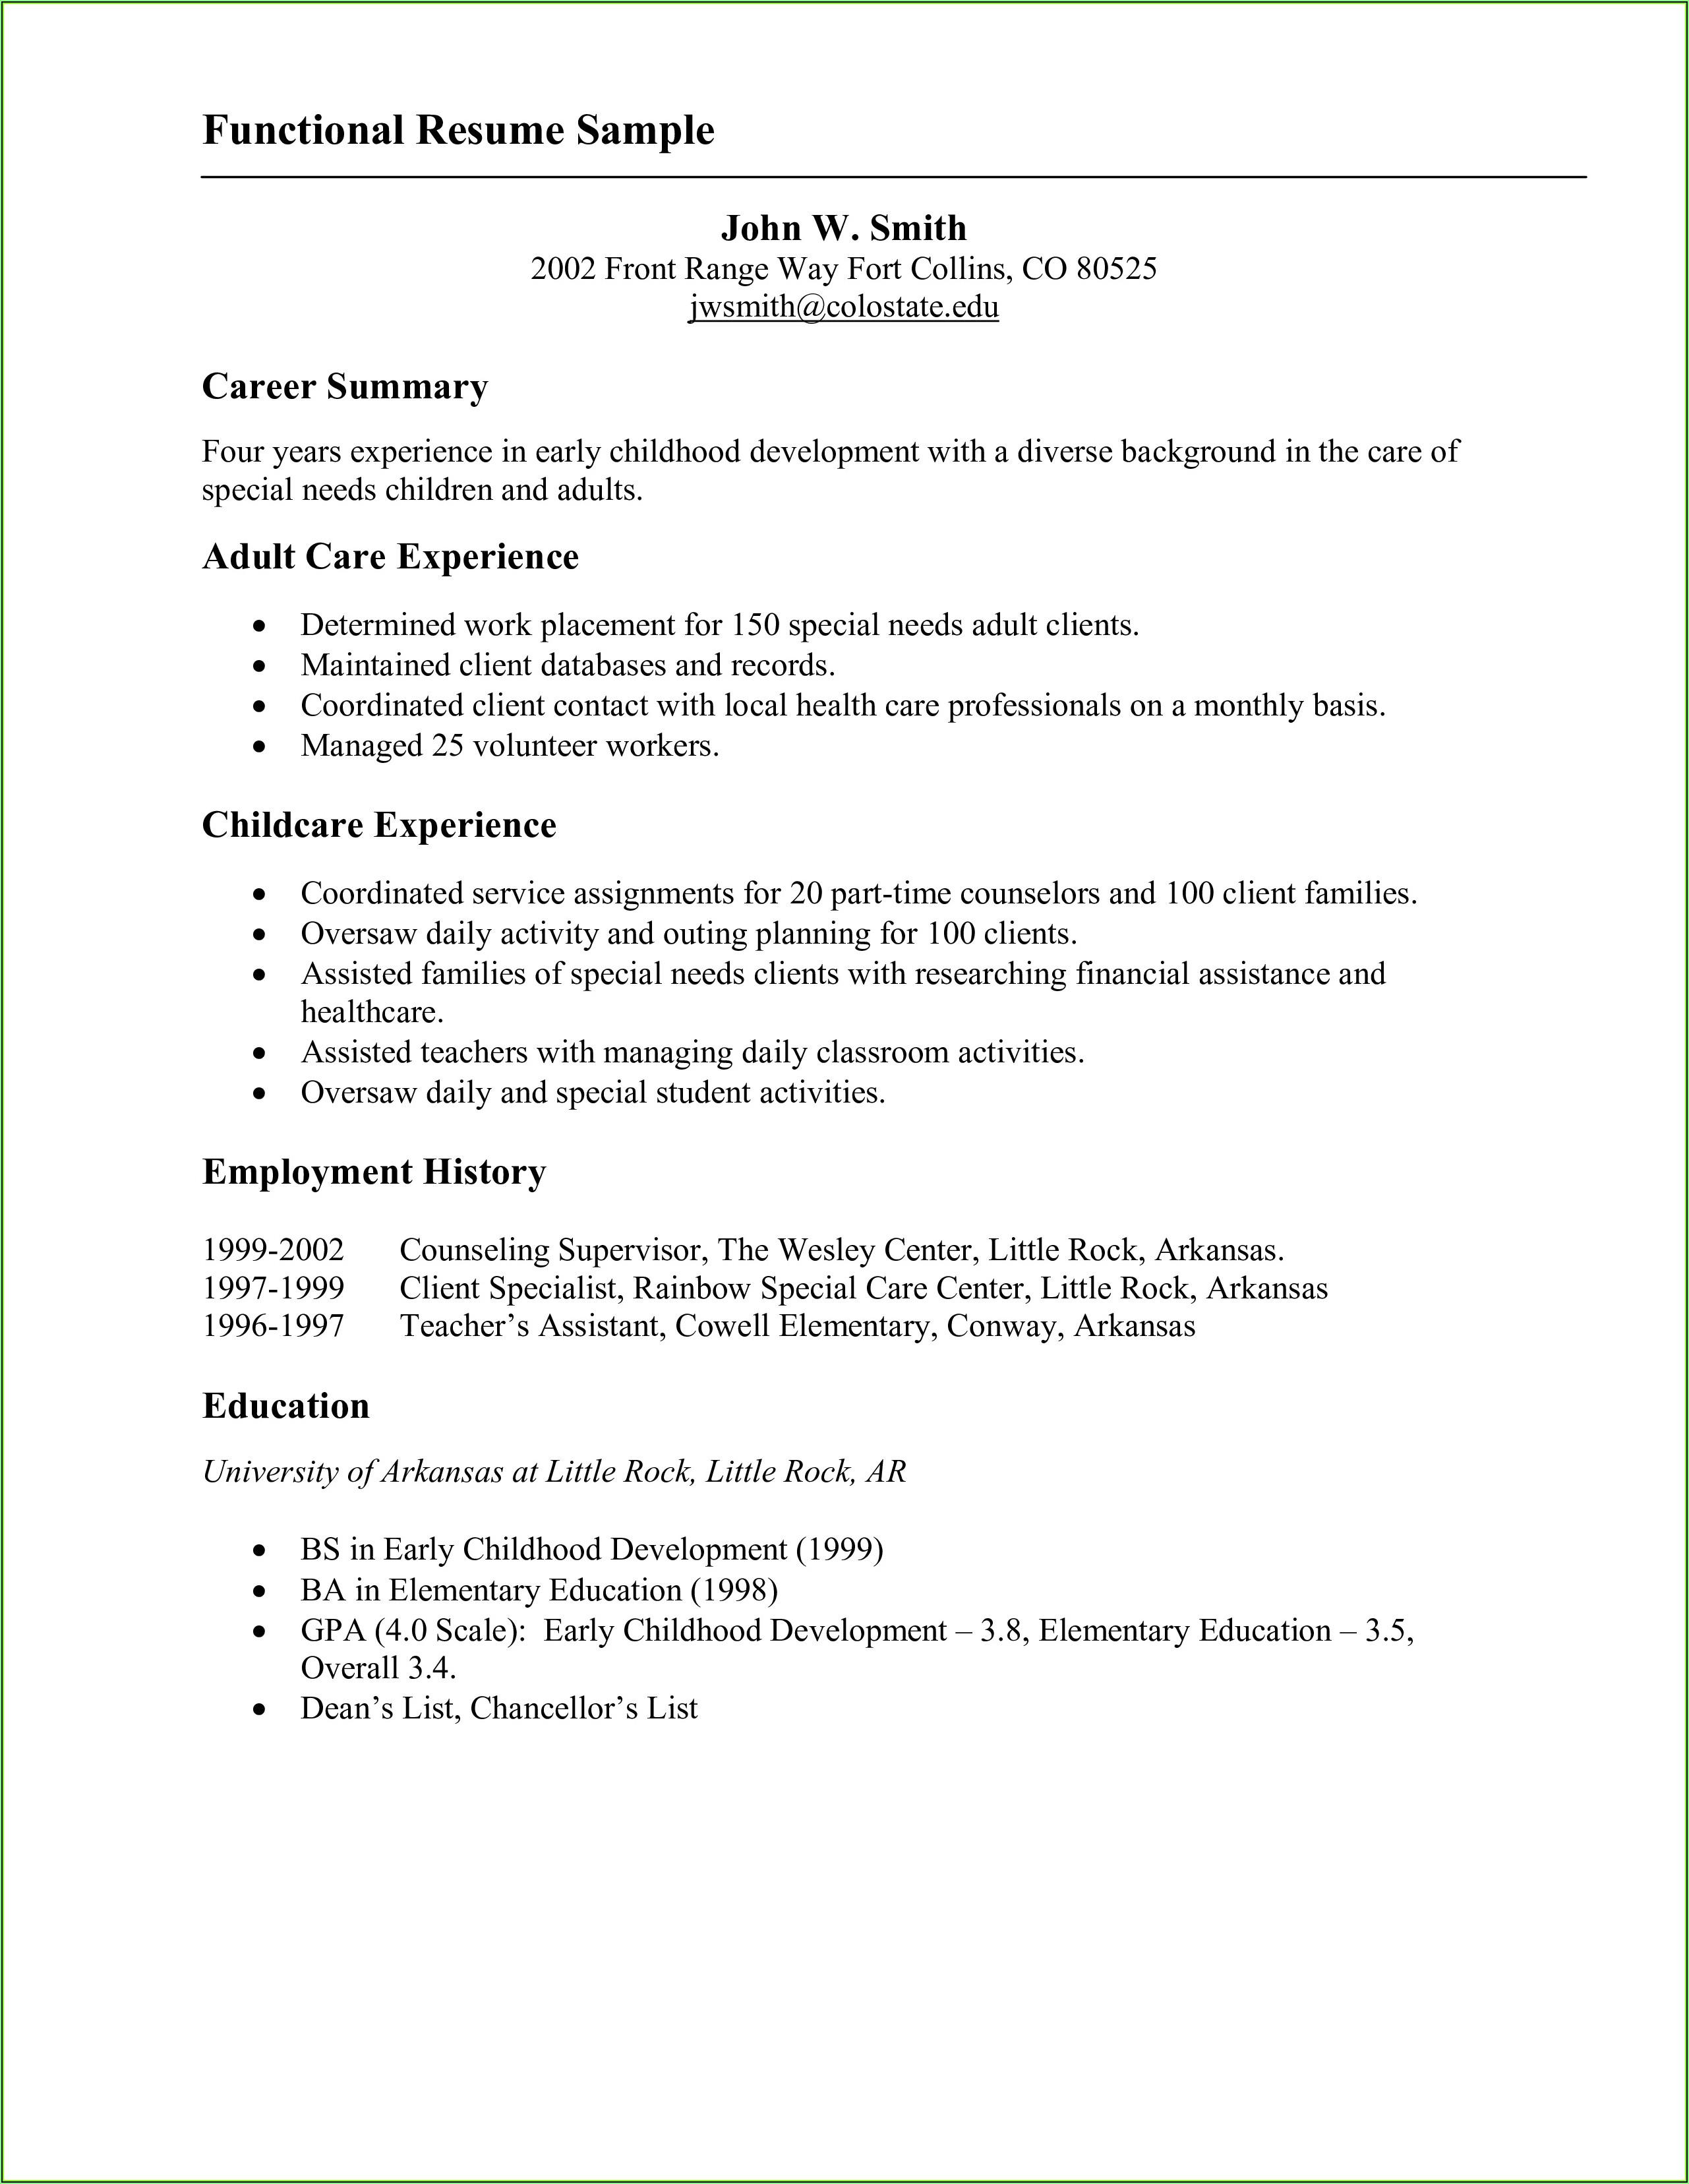 Resume Sample Template Download